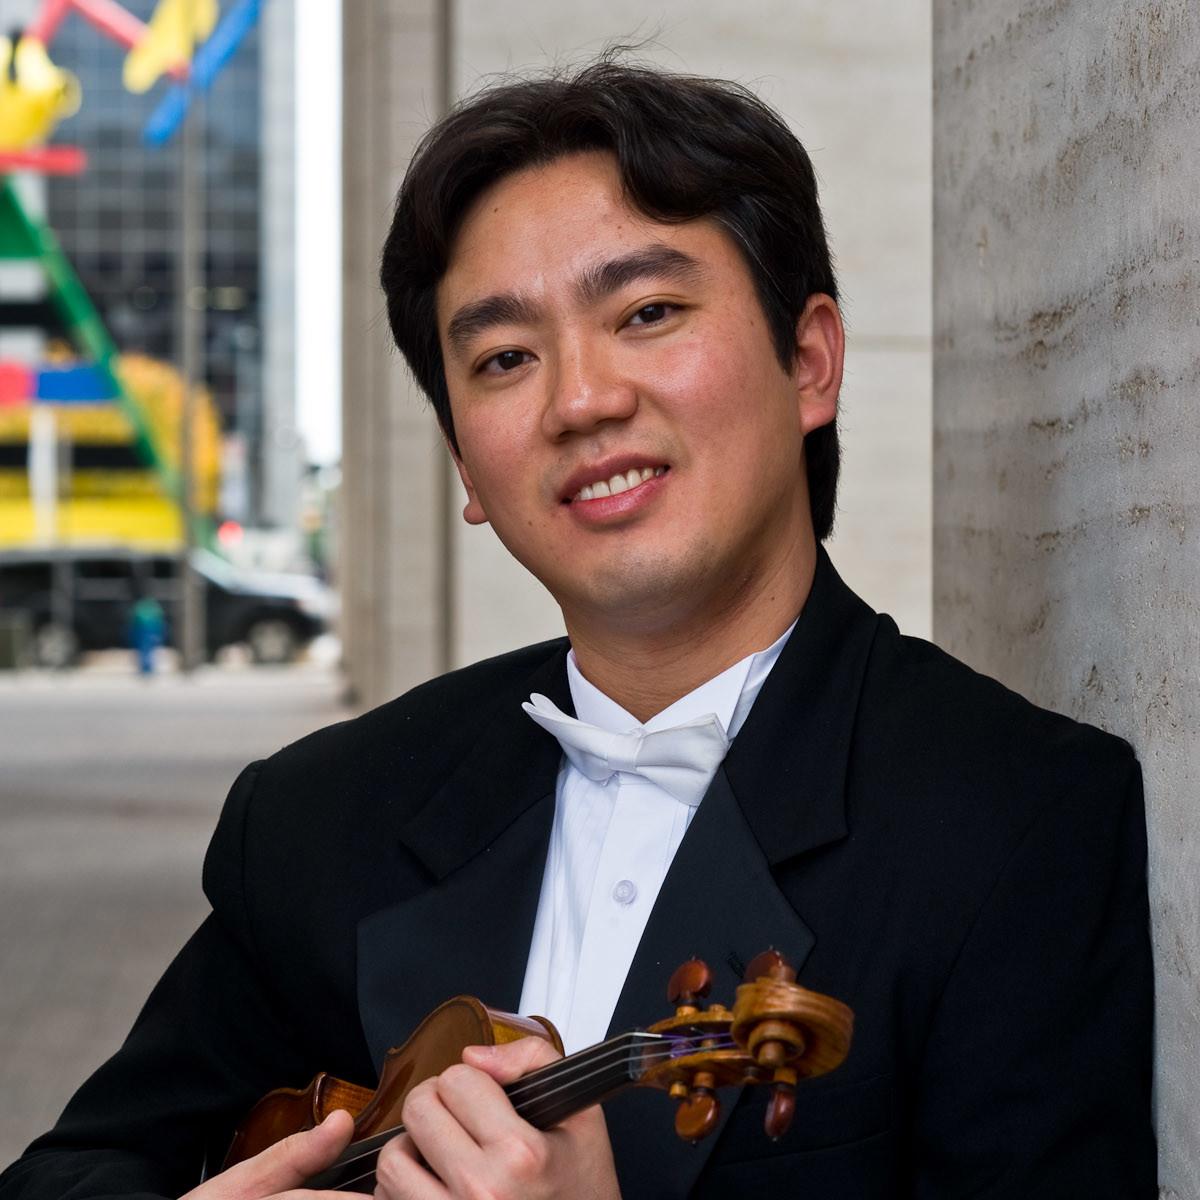 News_Huang Fitlow Symphony concertmaster_Jan 10